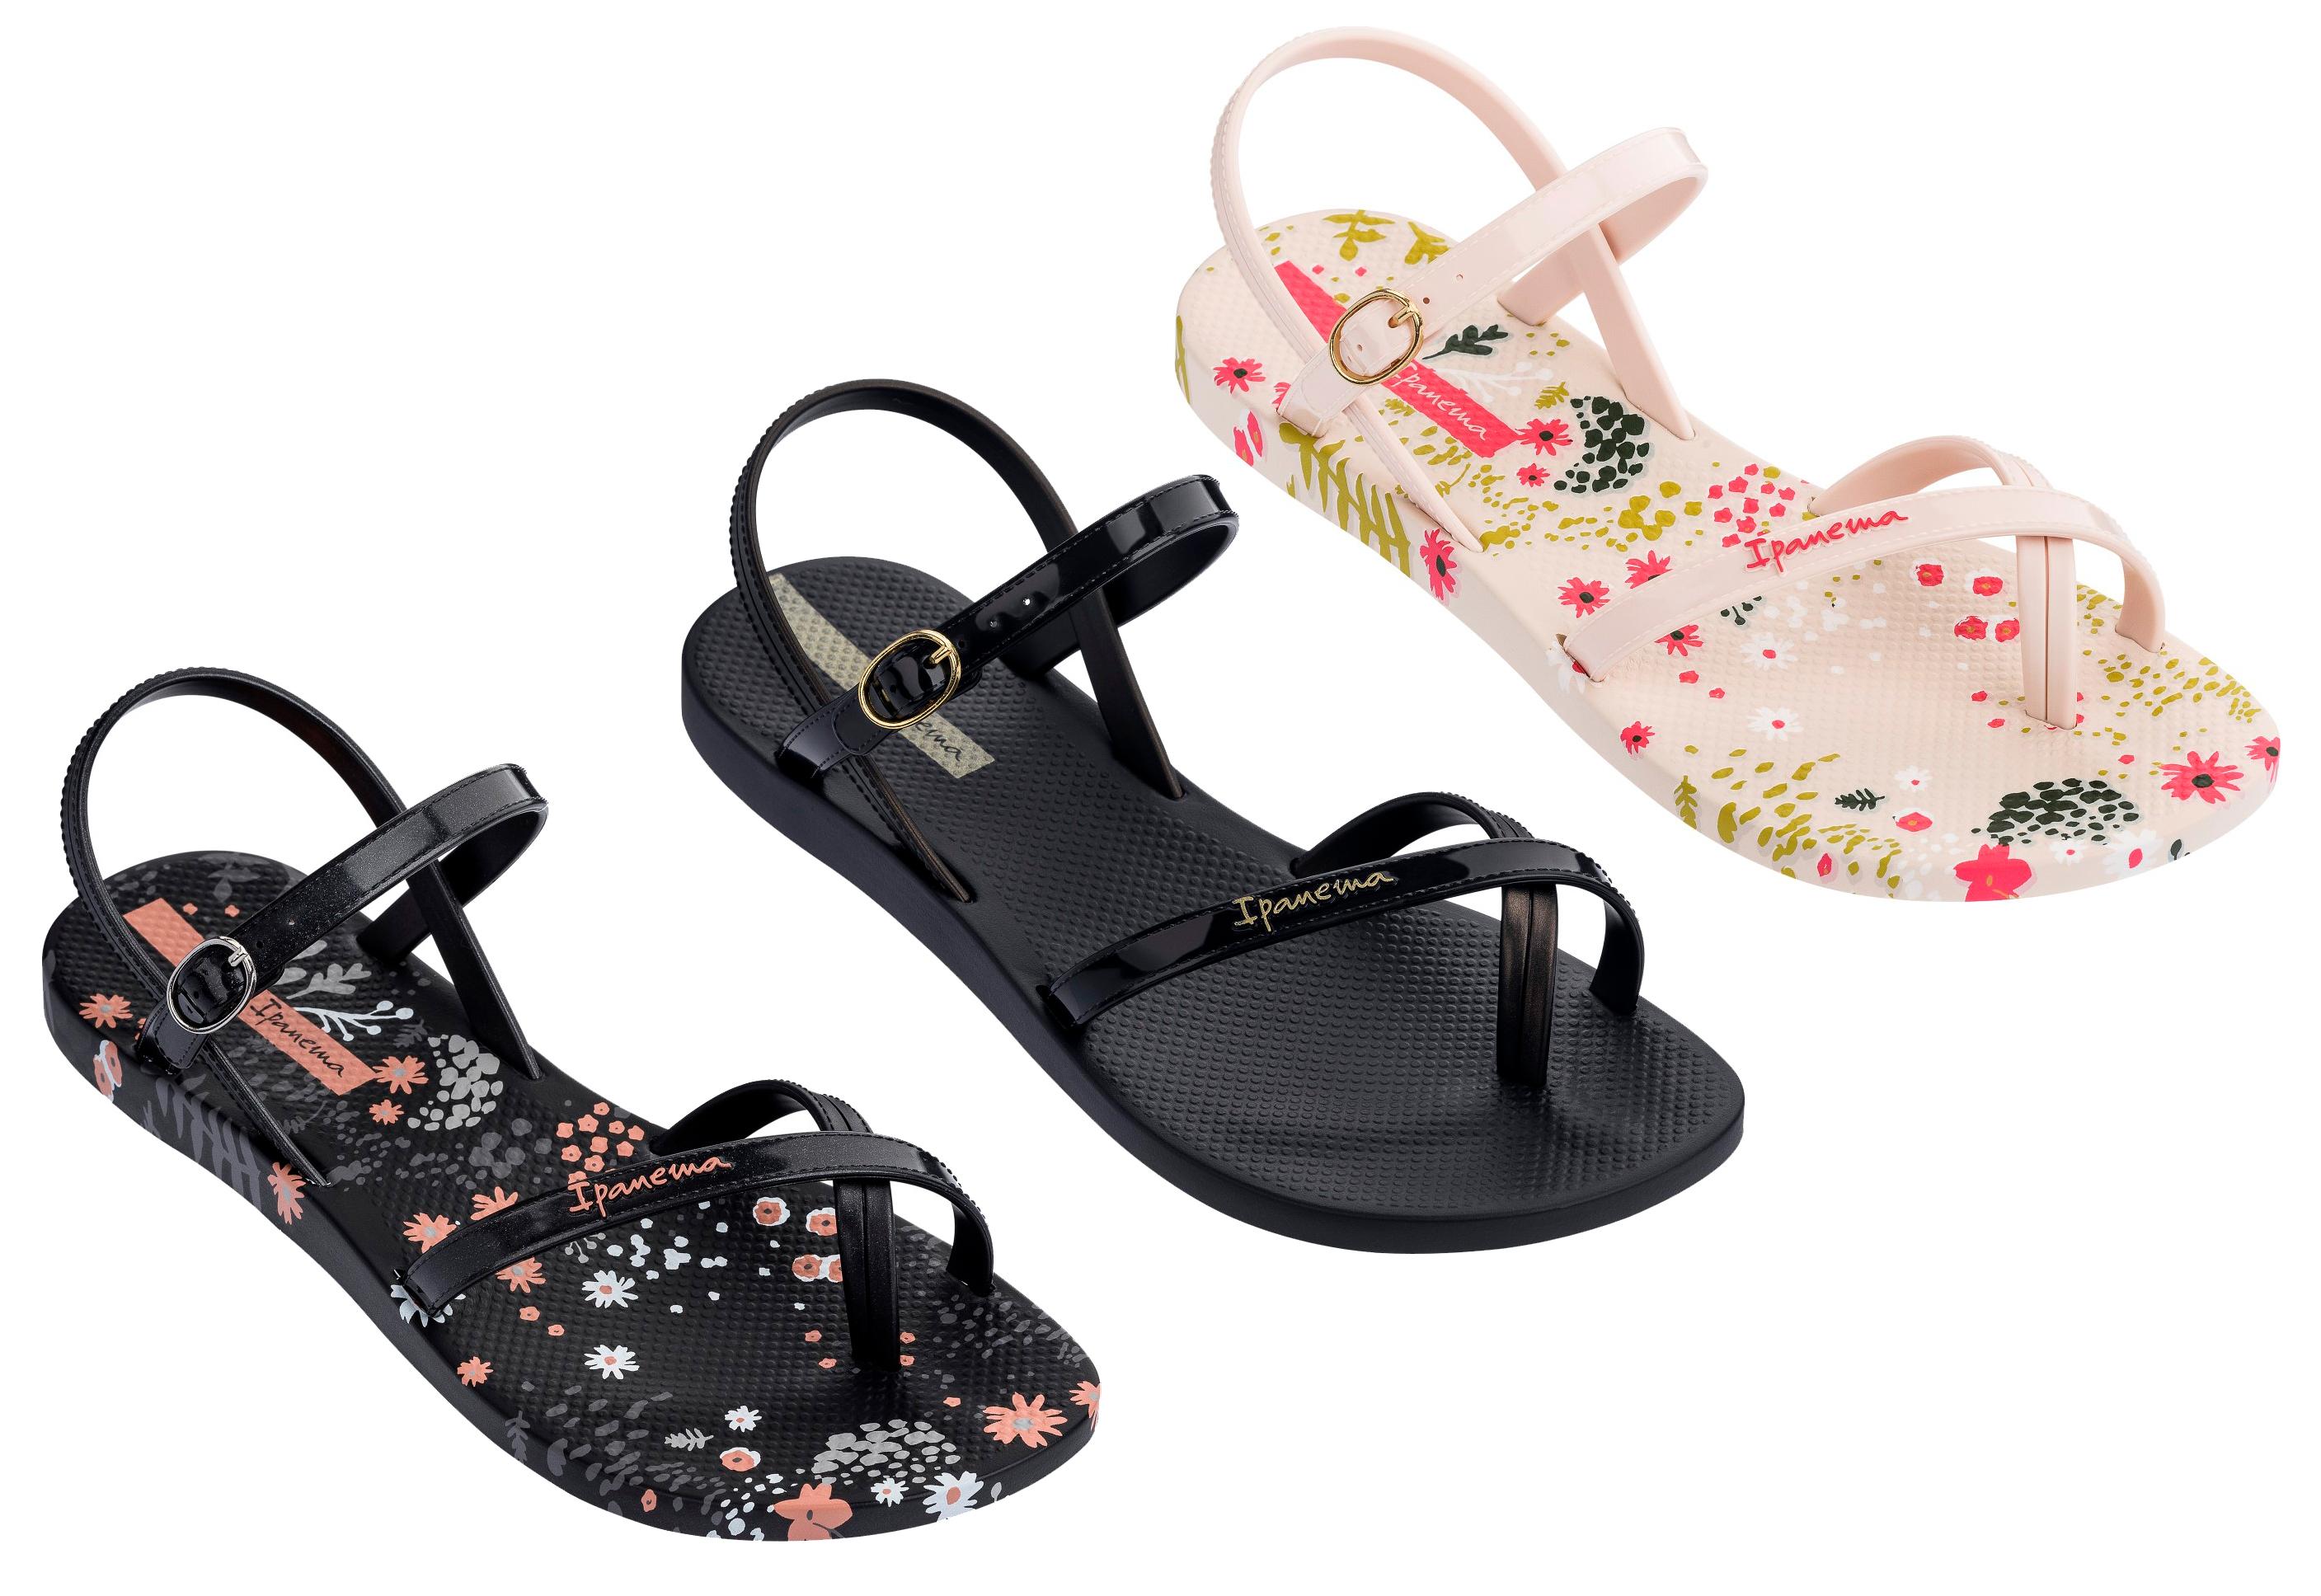 Ipanema Ladies Fashion Sandal 21 Black Flower